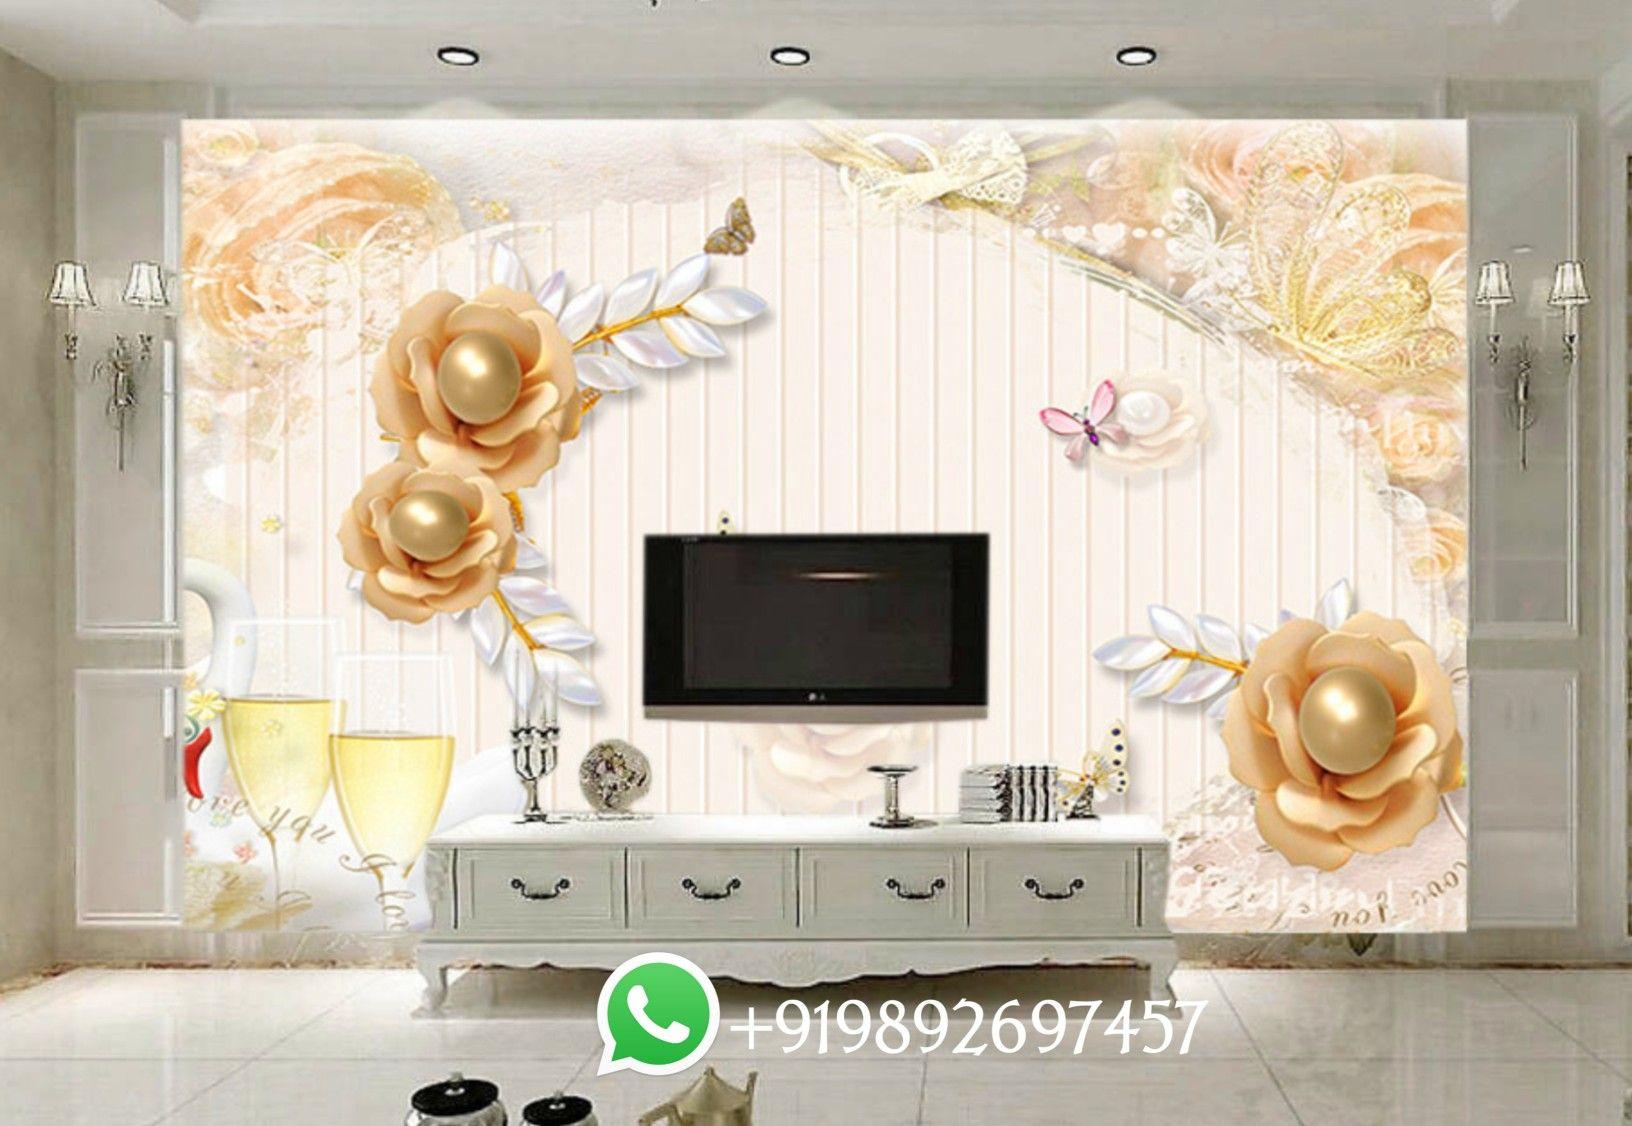 5d Amazing Wallpaper For Living Room Tv Unit Area Design 5d Wallpaper In Mumbai Near Me Living Room Tv Unit Wallpaper Living Room Living Room Tv 3d ceiling wallpaper india